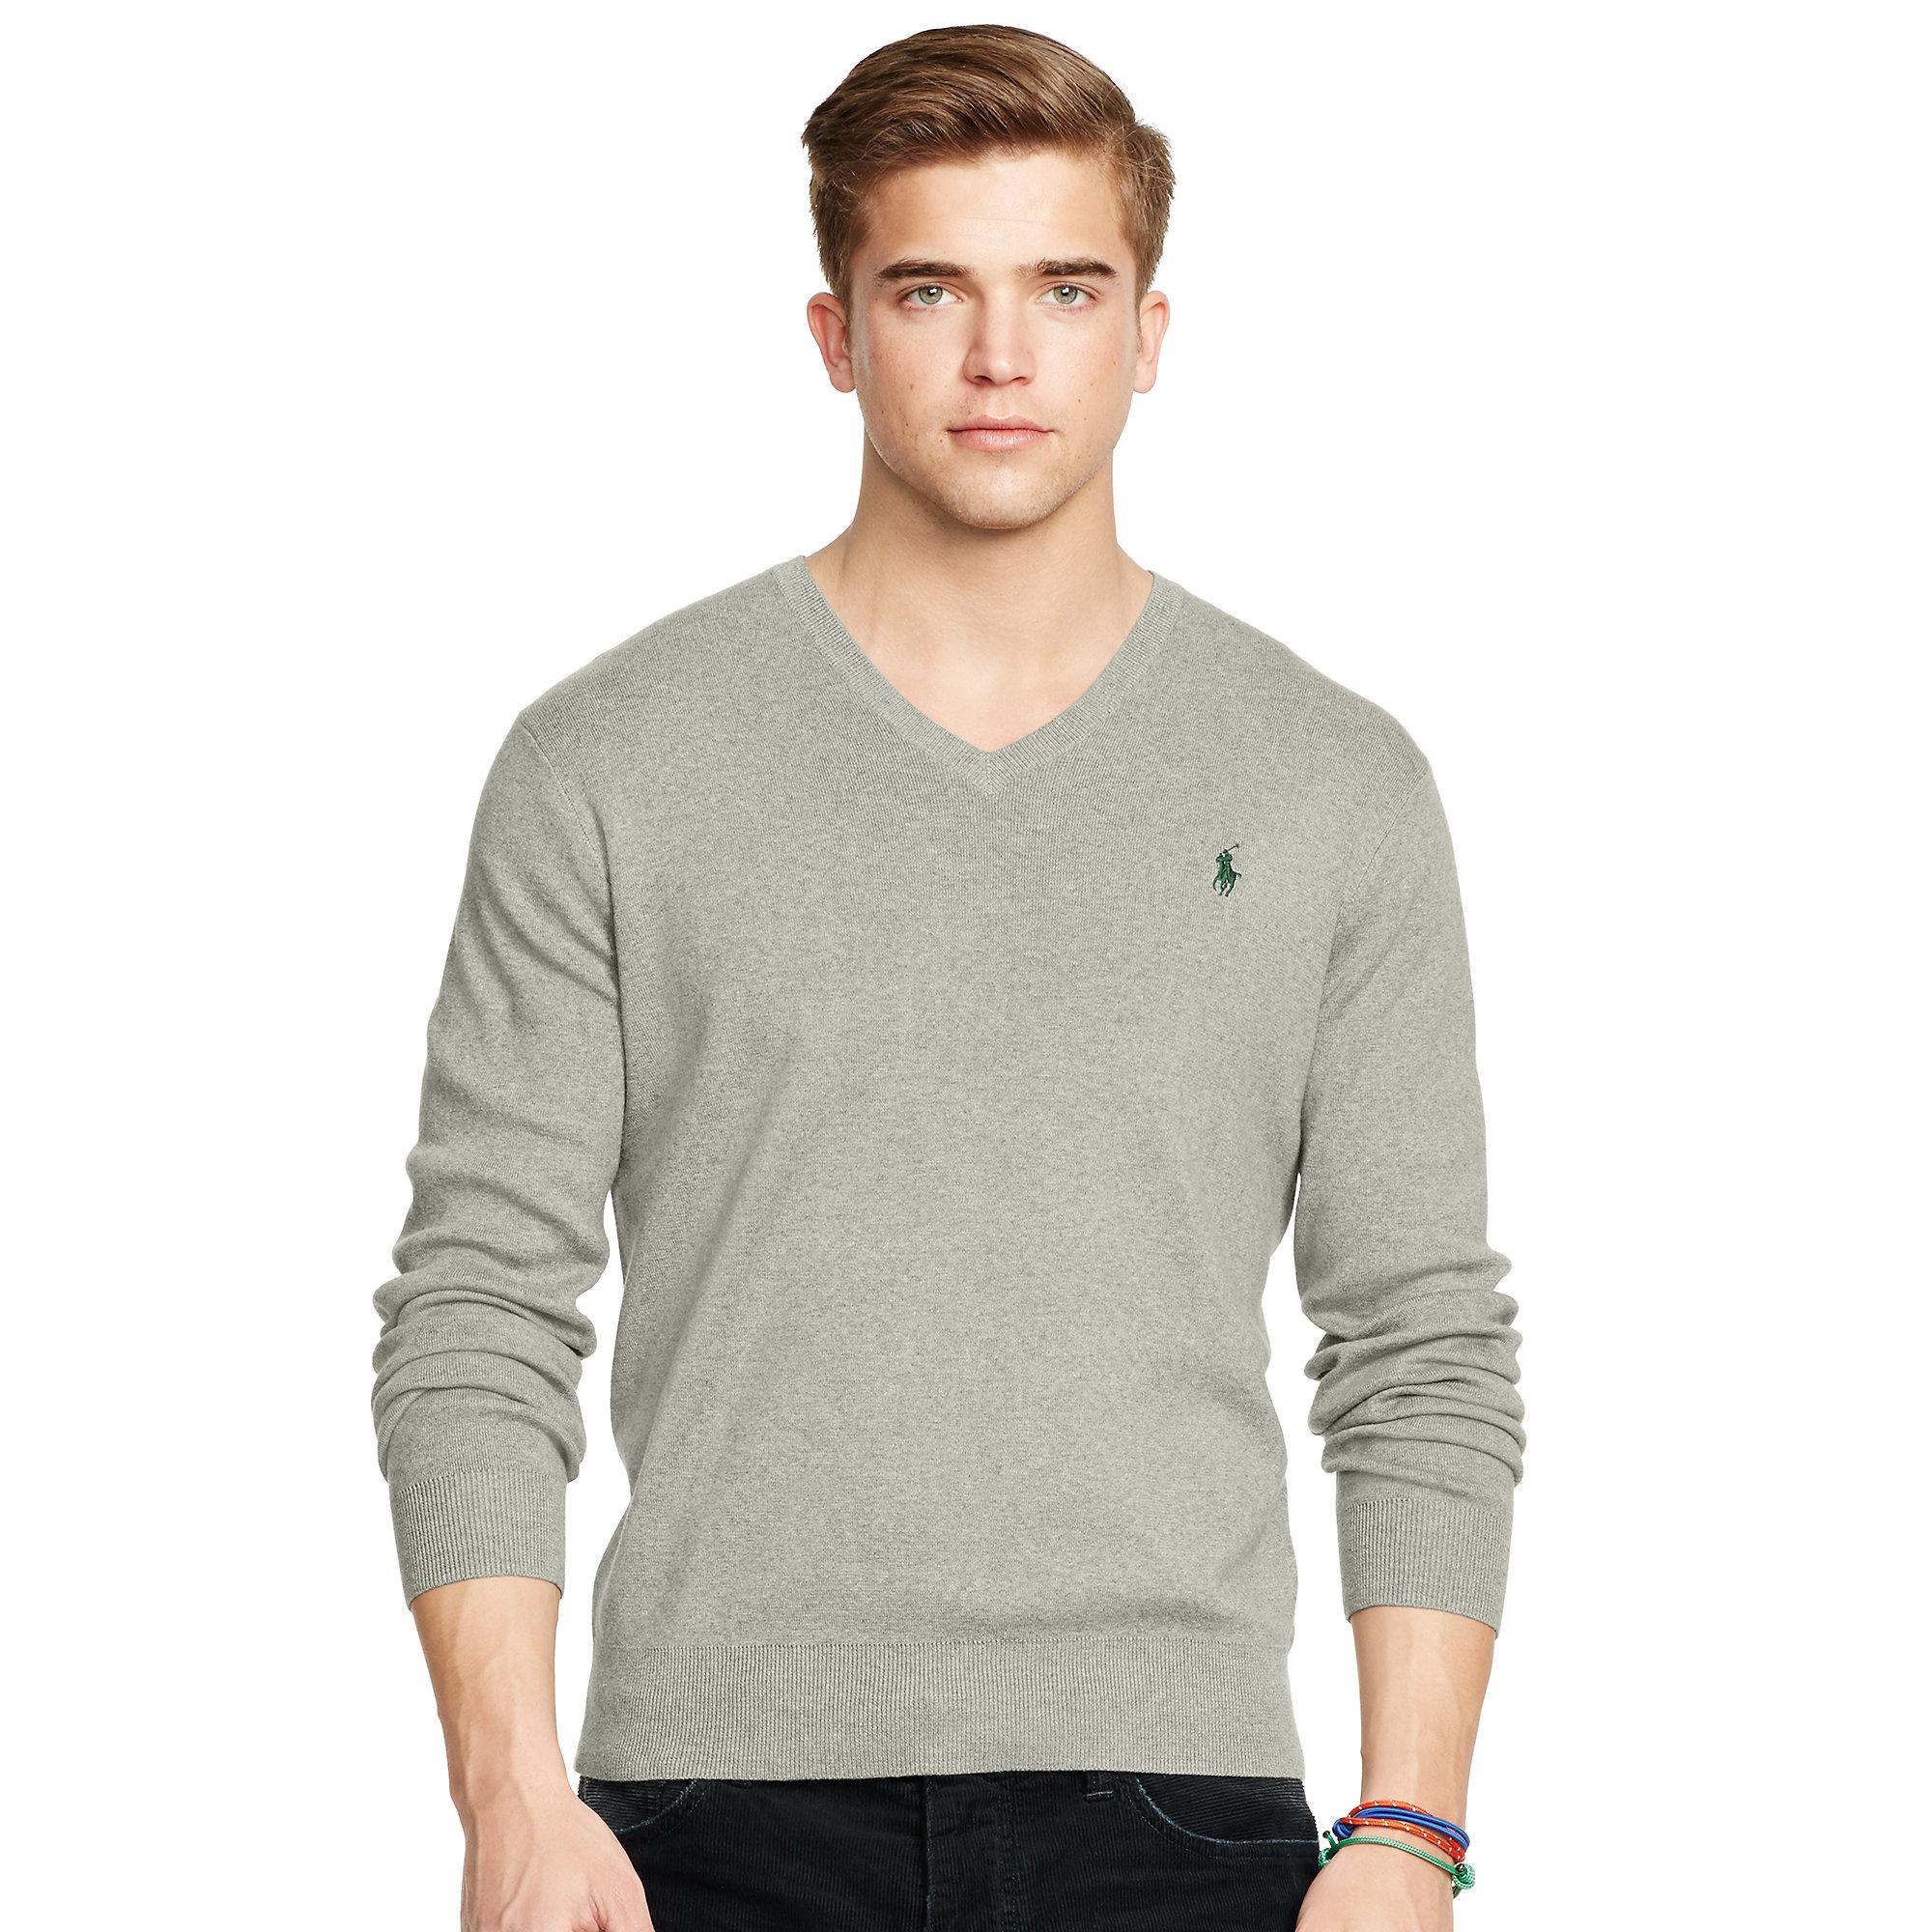 Lyst - Polo Ralph Lauren Pima Cotton V-neck Sweater in Gray for Men 1769b22514